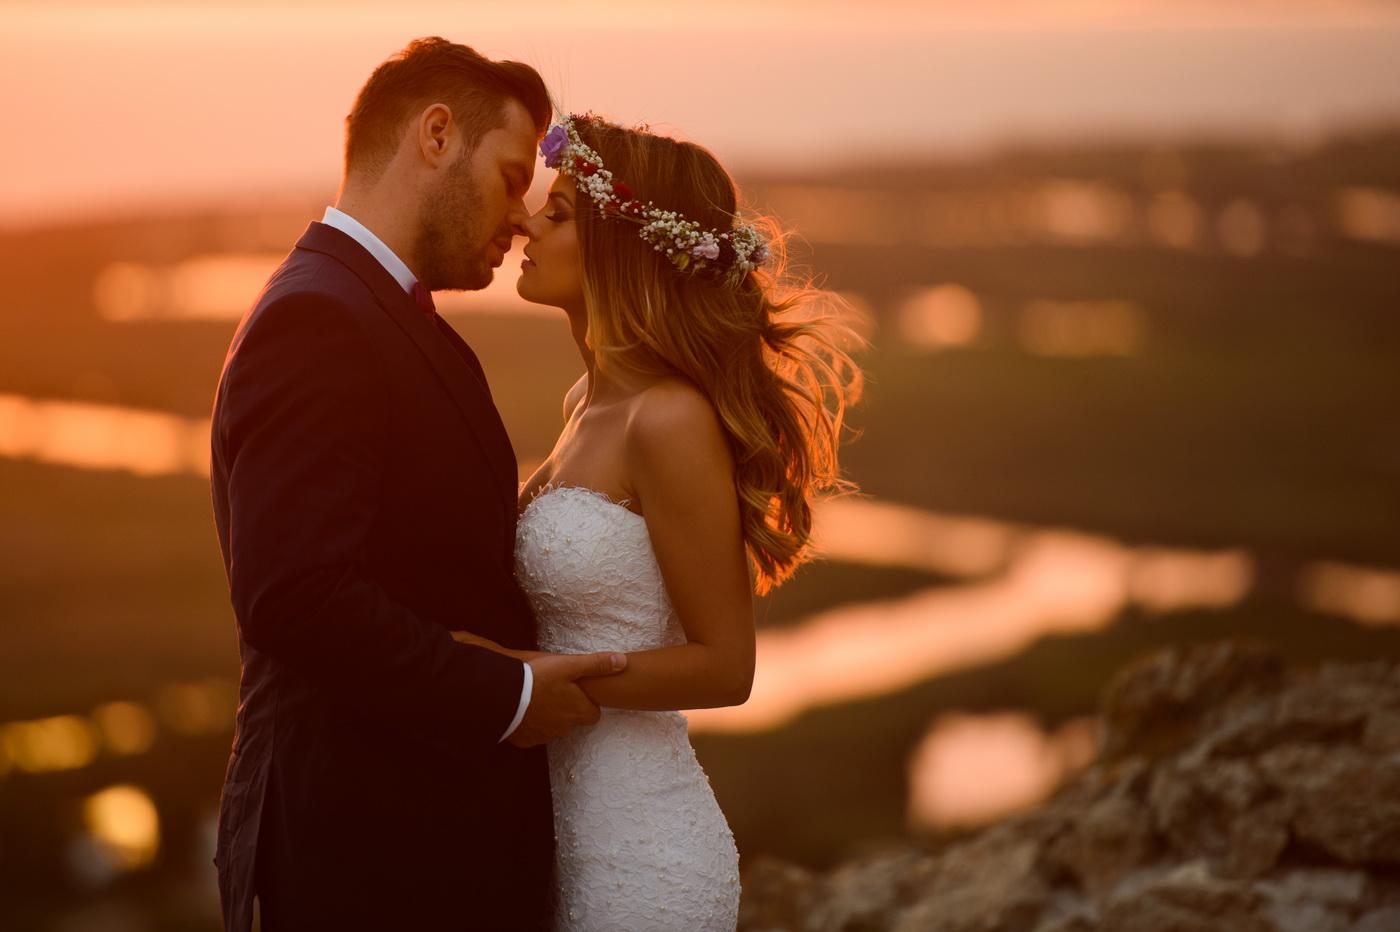 Destination Wedding Photographer_Marian Sterea_073.jpg